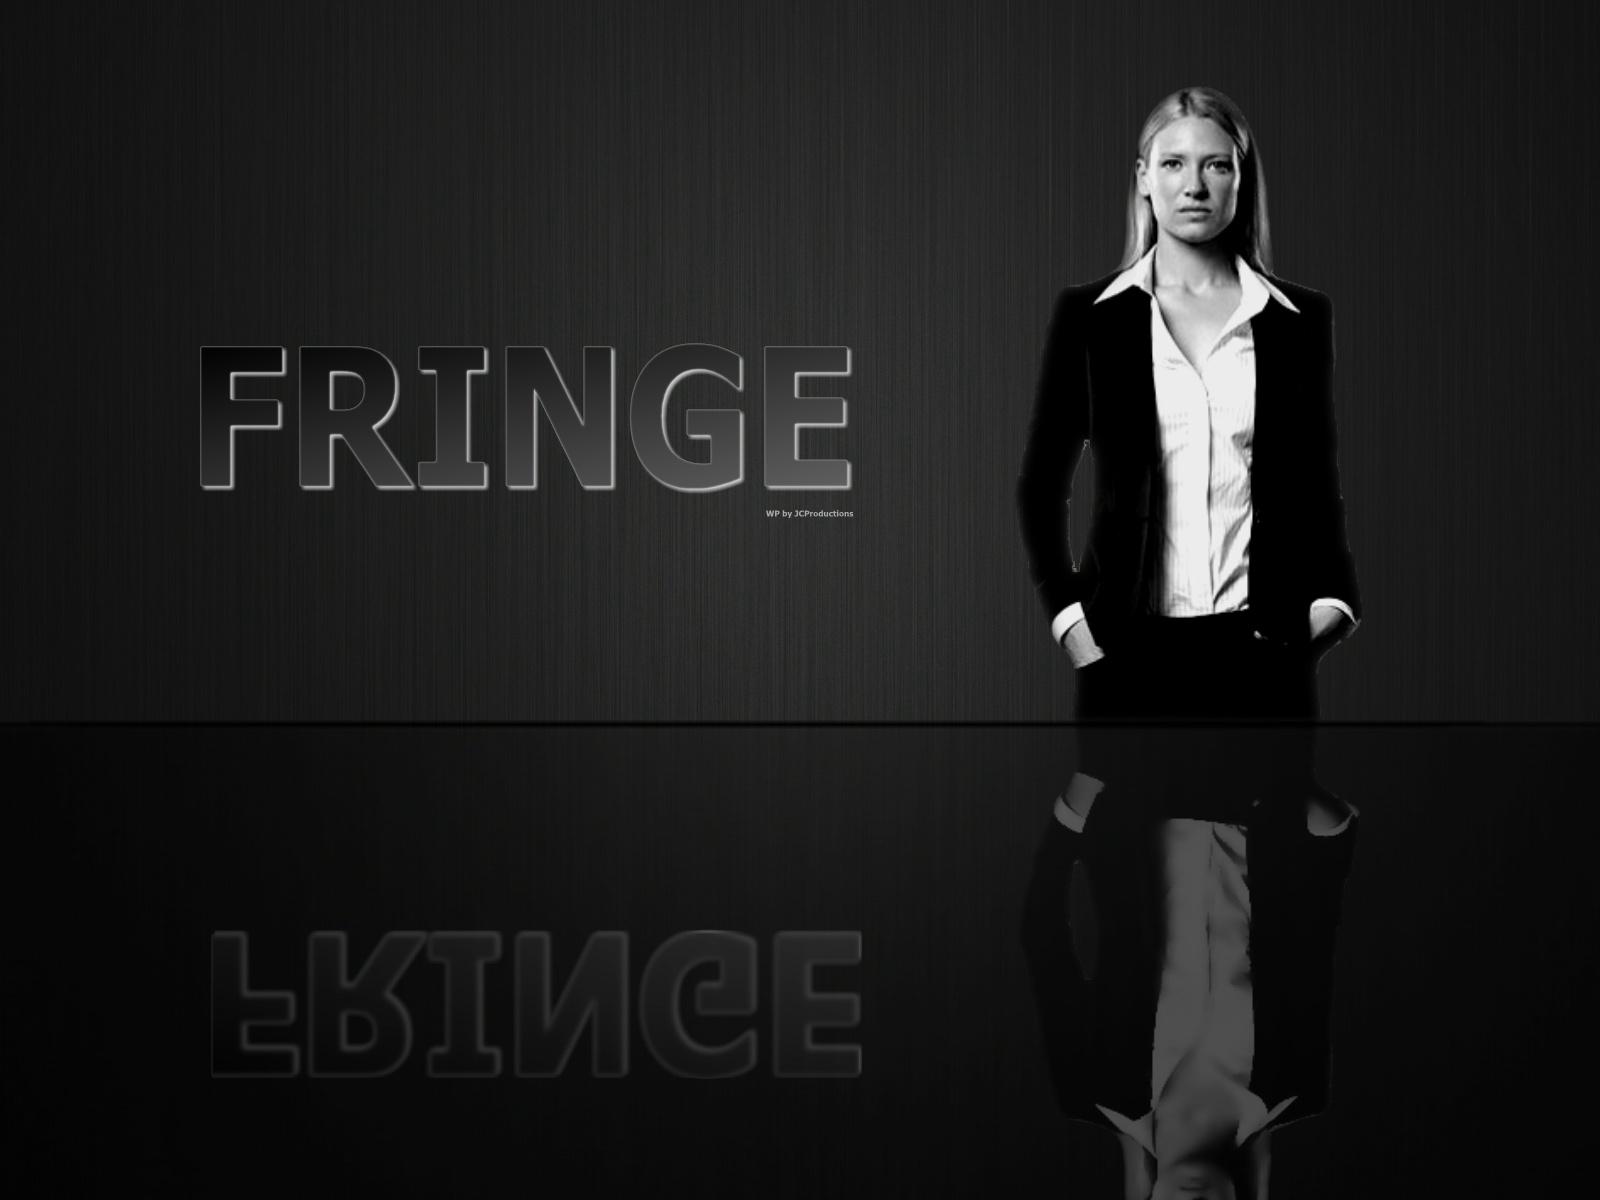 Download High quality fringe, anna torv, fringe wallpapers, olivia dunham, weird science, peter bishop, dunham, agent Fringe wallpaper / 1600x1200